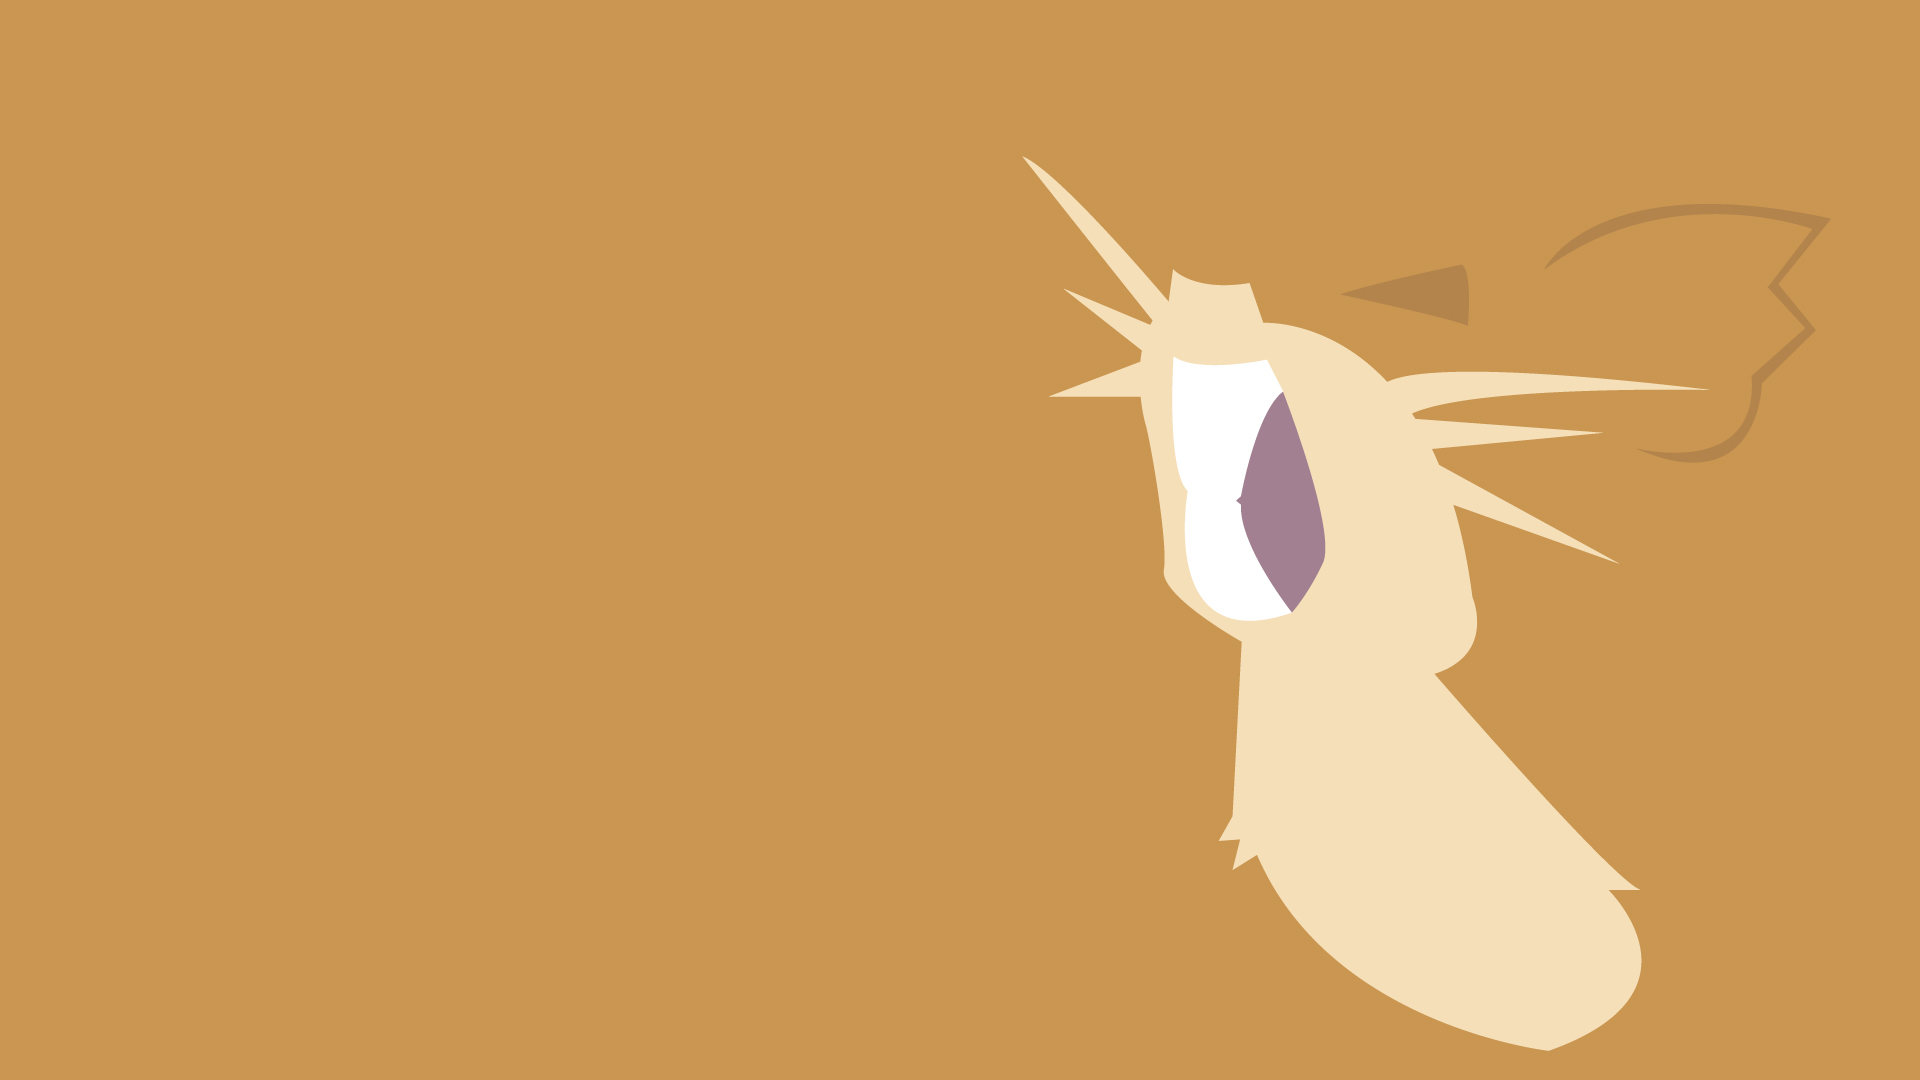 pokemon minimalist wallpaper 868141